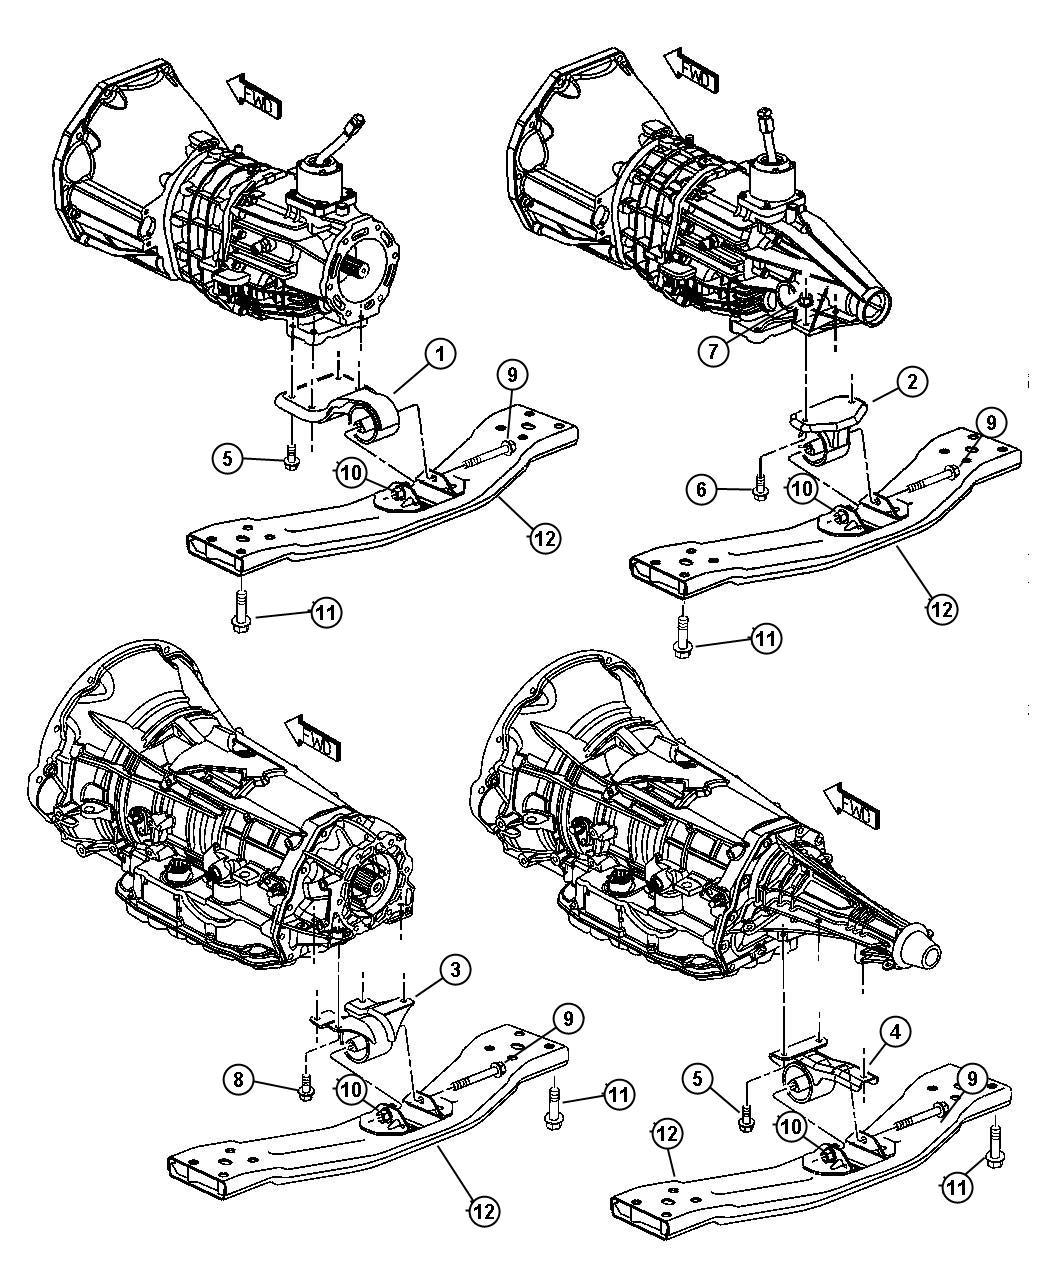 2002 Jeep Liberty Mounting Engine, Rear, 3.7L [EKG]